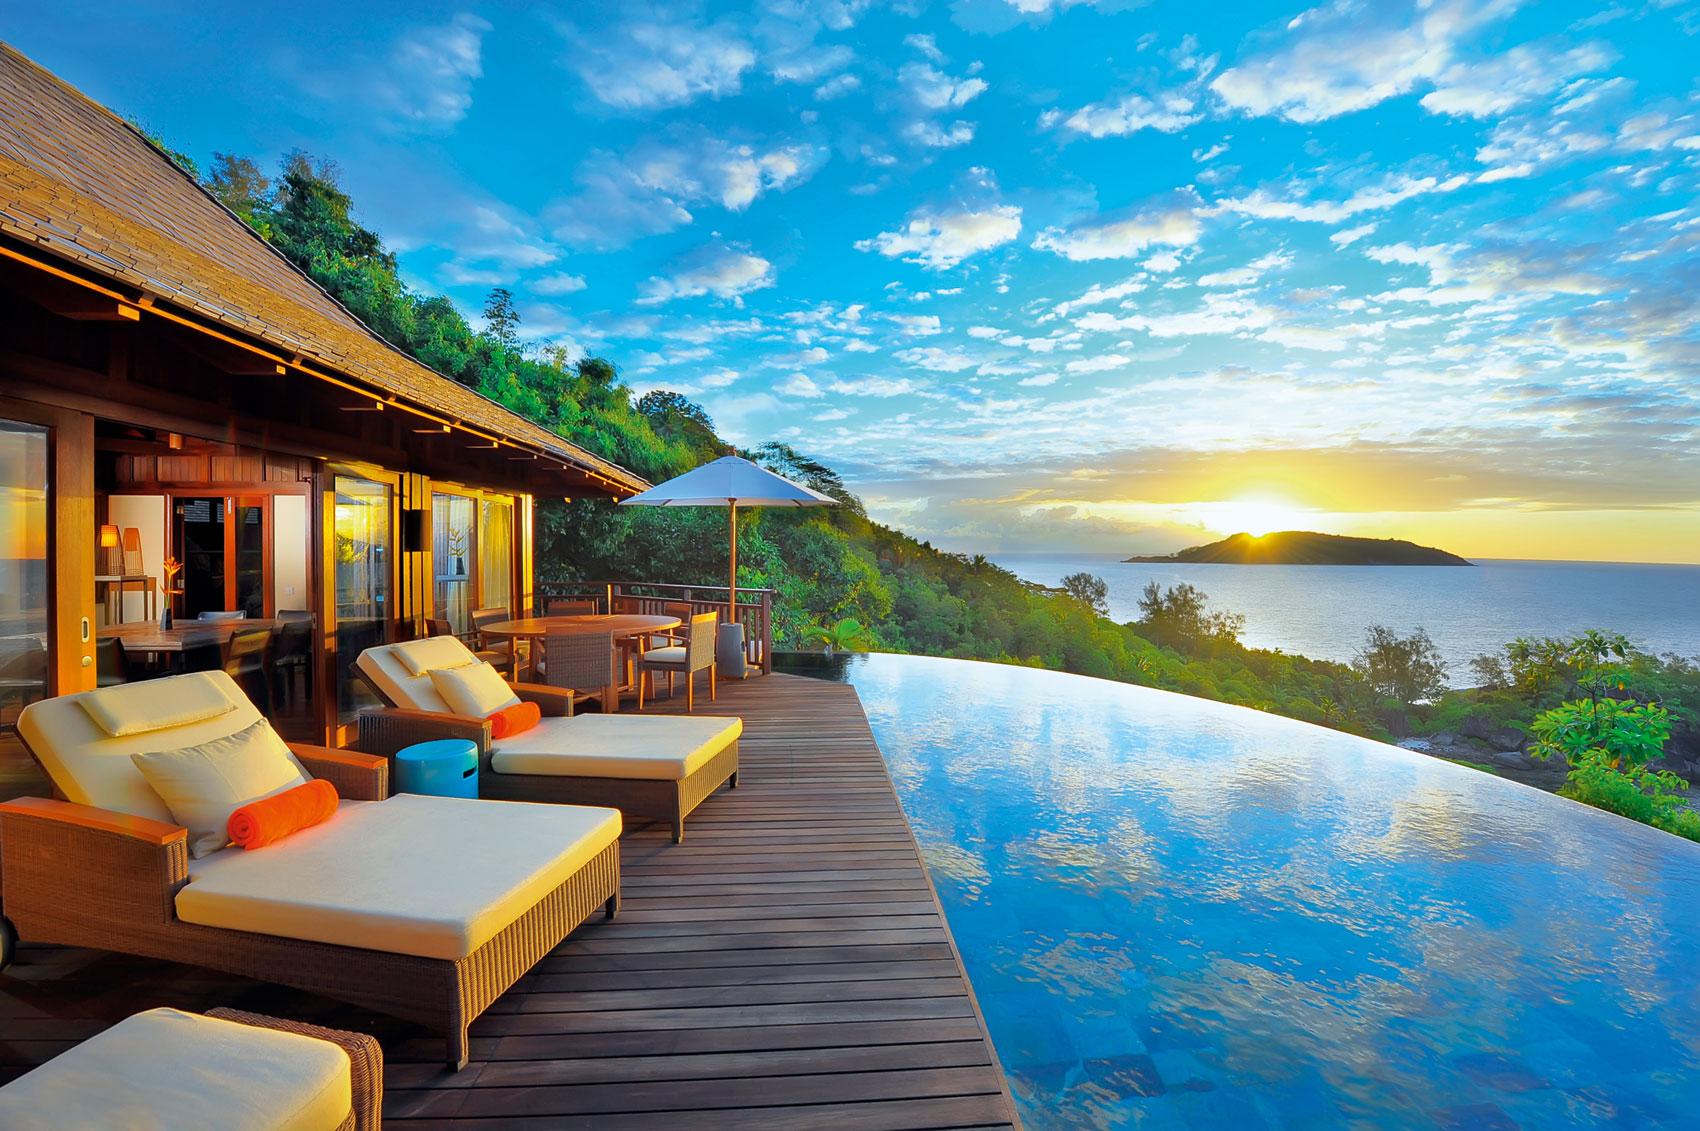 Constance-Ephelia-Seychelles-58